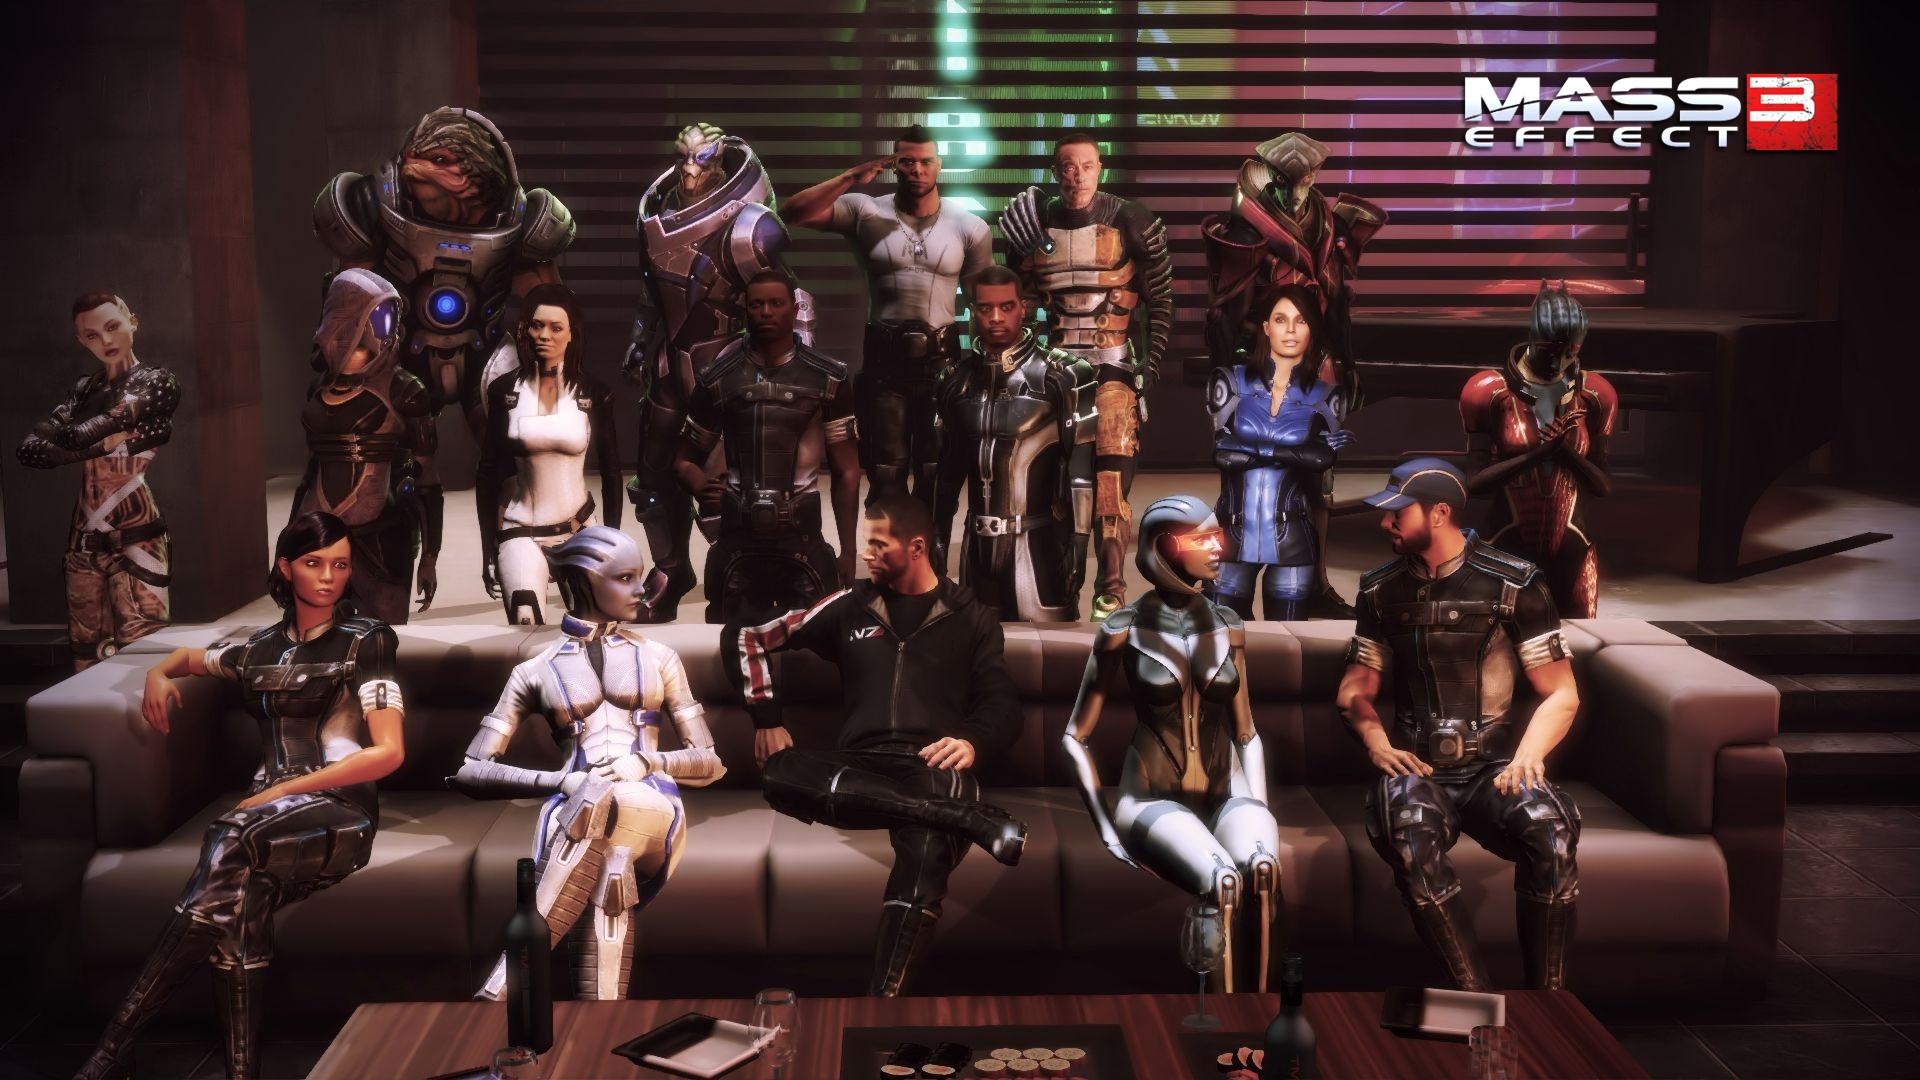 Mass-Effect-3-CitadelDLC-Normandy-Crew